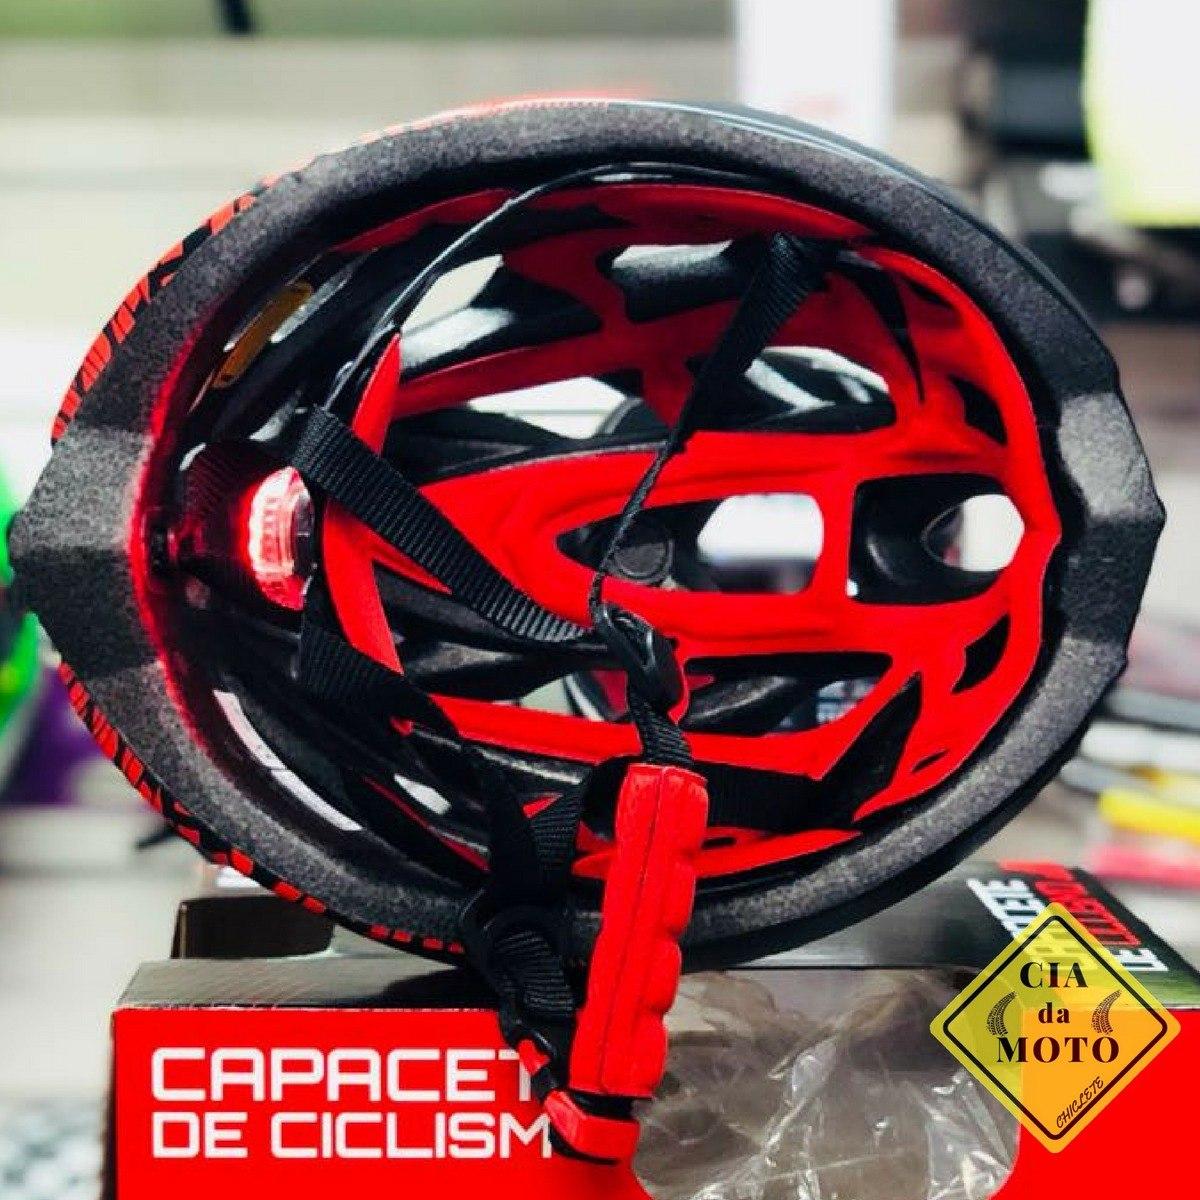 d560a8cd3 Capacete Bike Ciclismo Mtb High One Leone Bicicleta - R  159